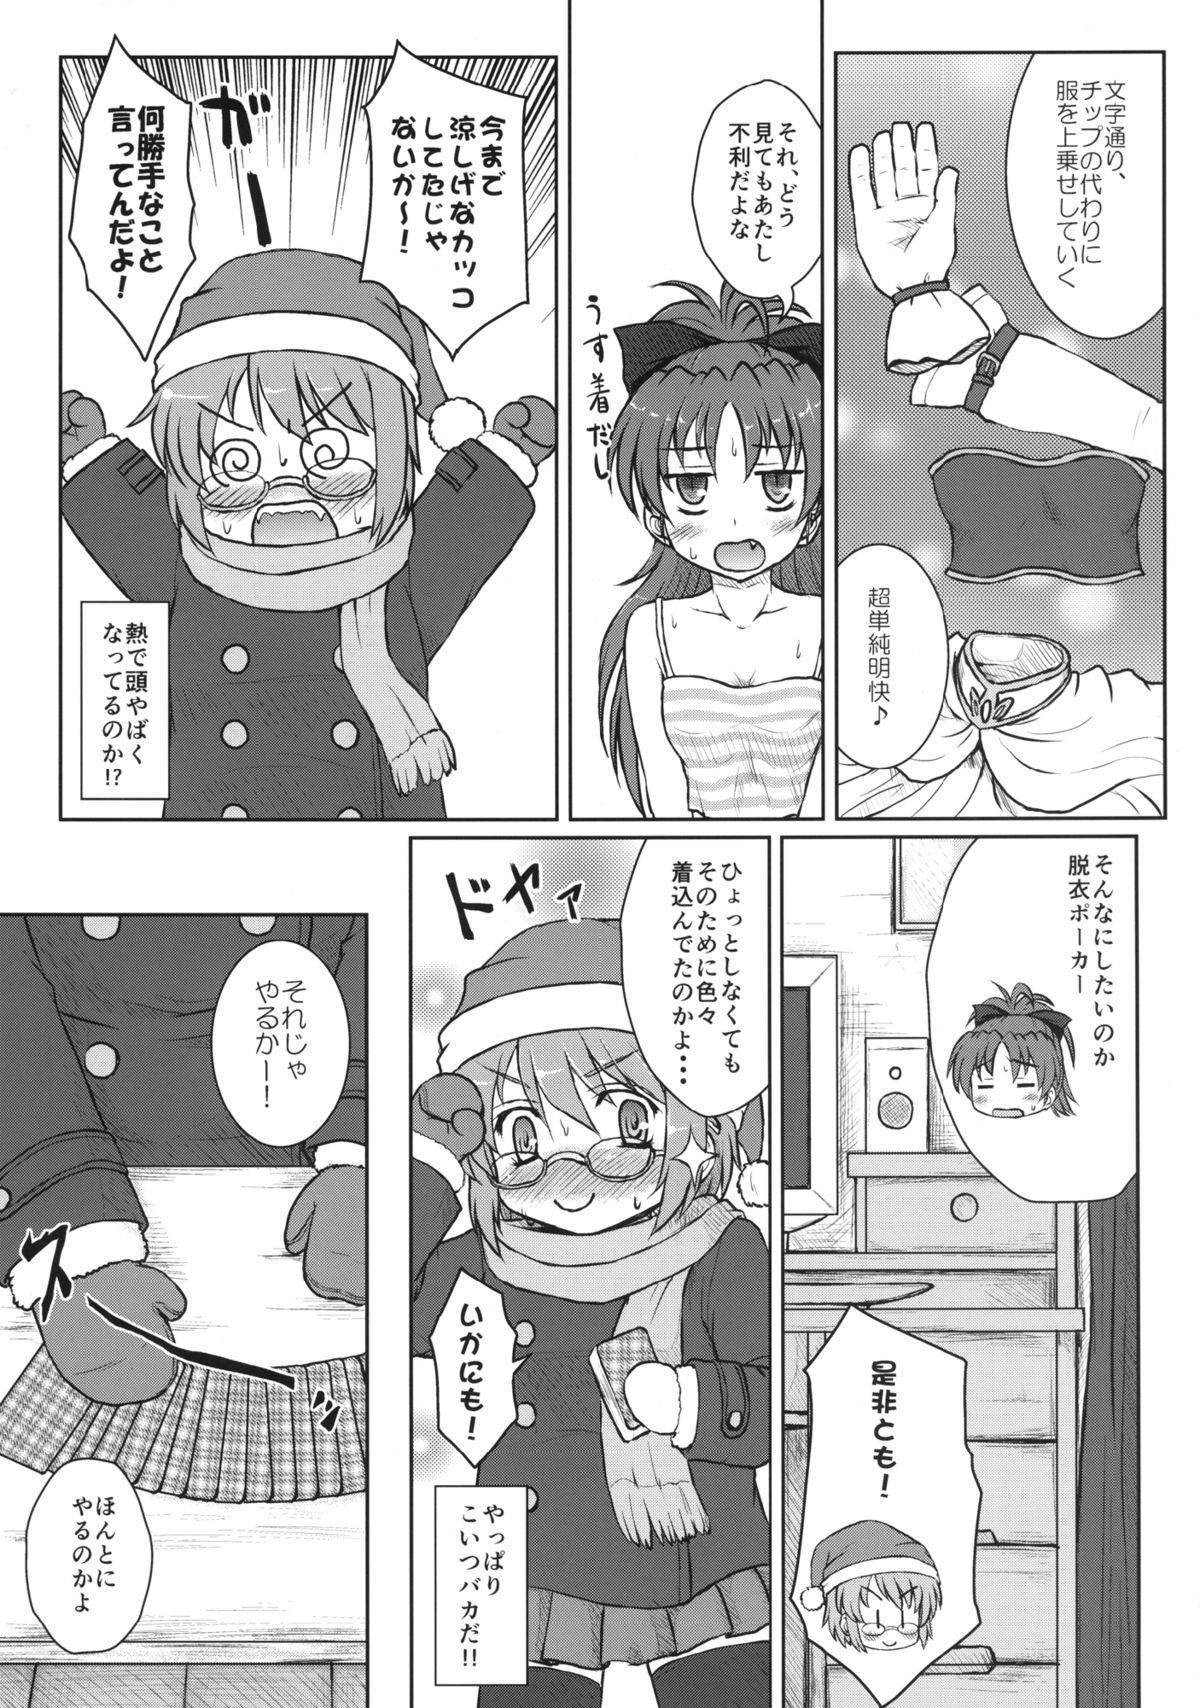 (SHT2013 Haru) [Newtype Kenkyuujo (Kotowari)] Sayaka-san to Kyouko-san (Puella Magi Madoka Magica) 6